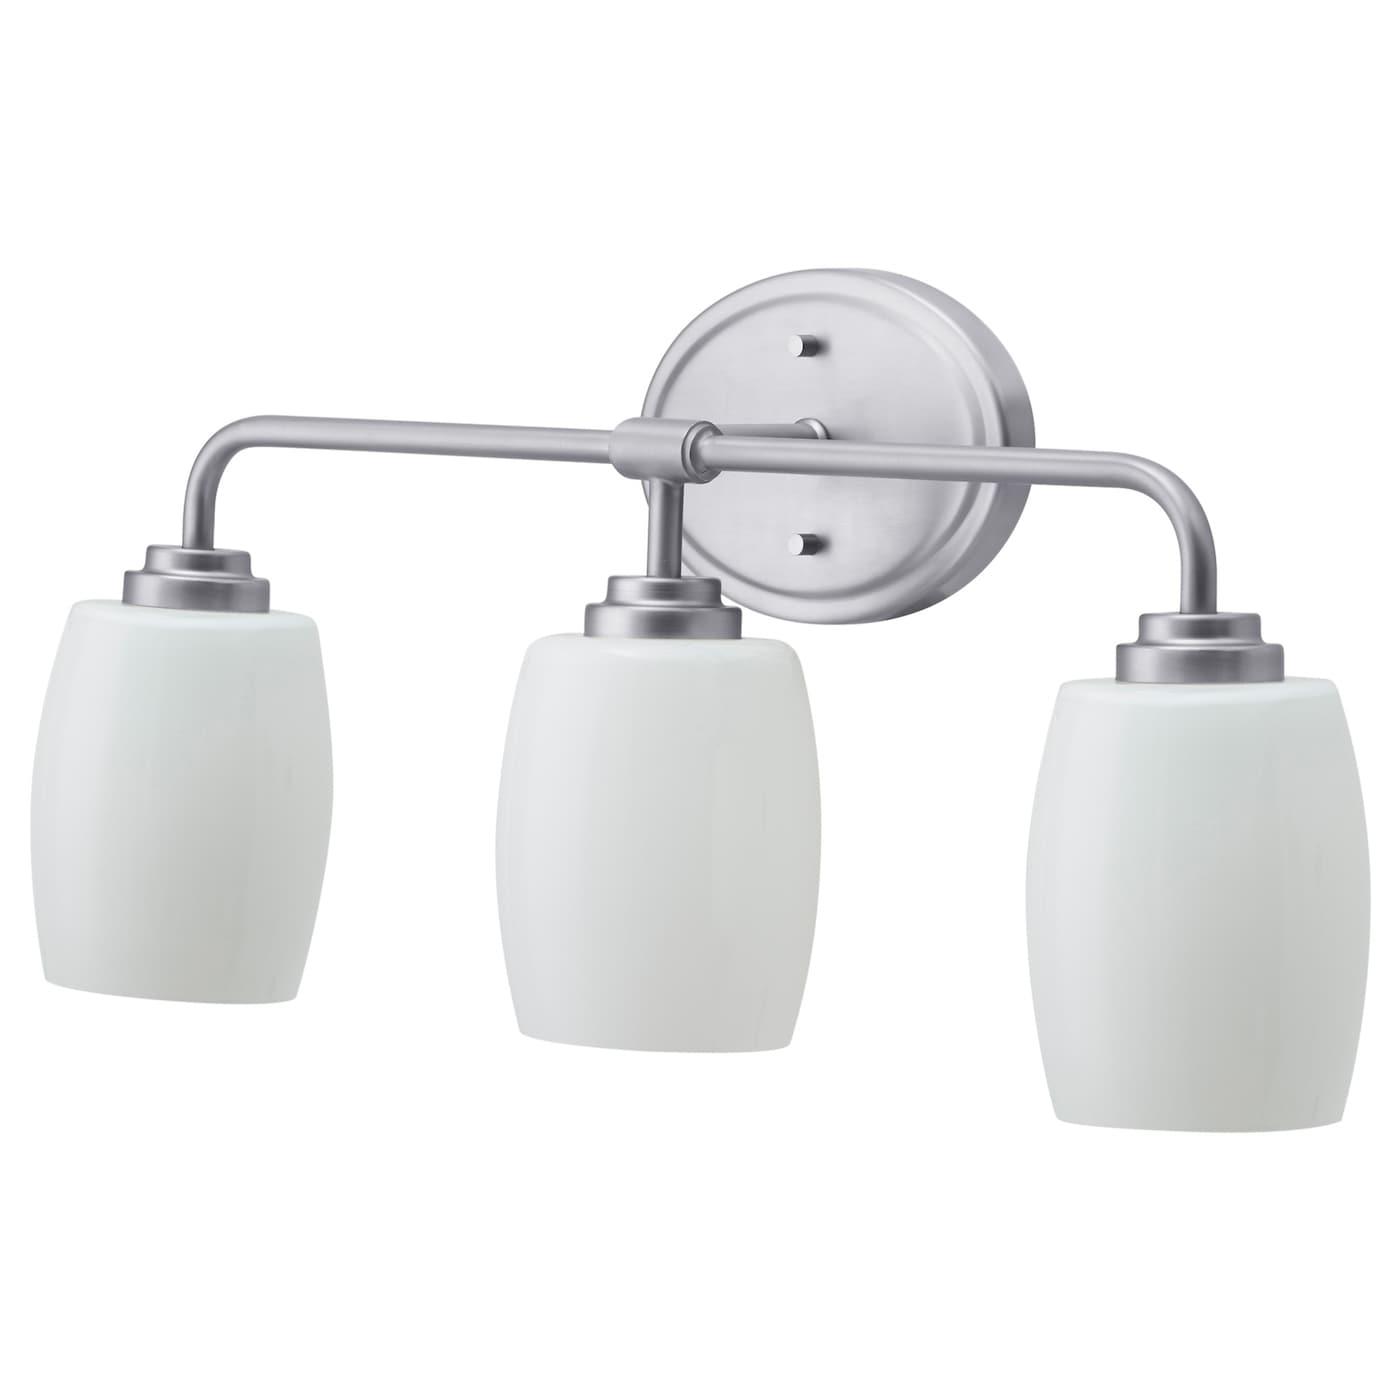 Wall Lamp 3 Spots Nickel Plated